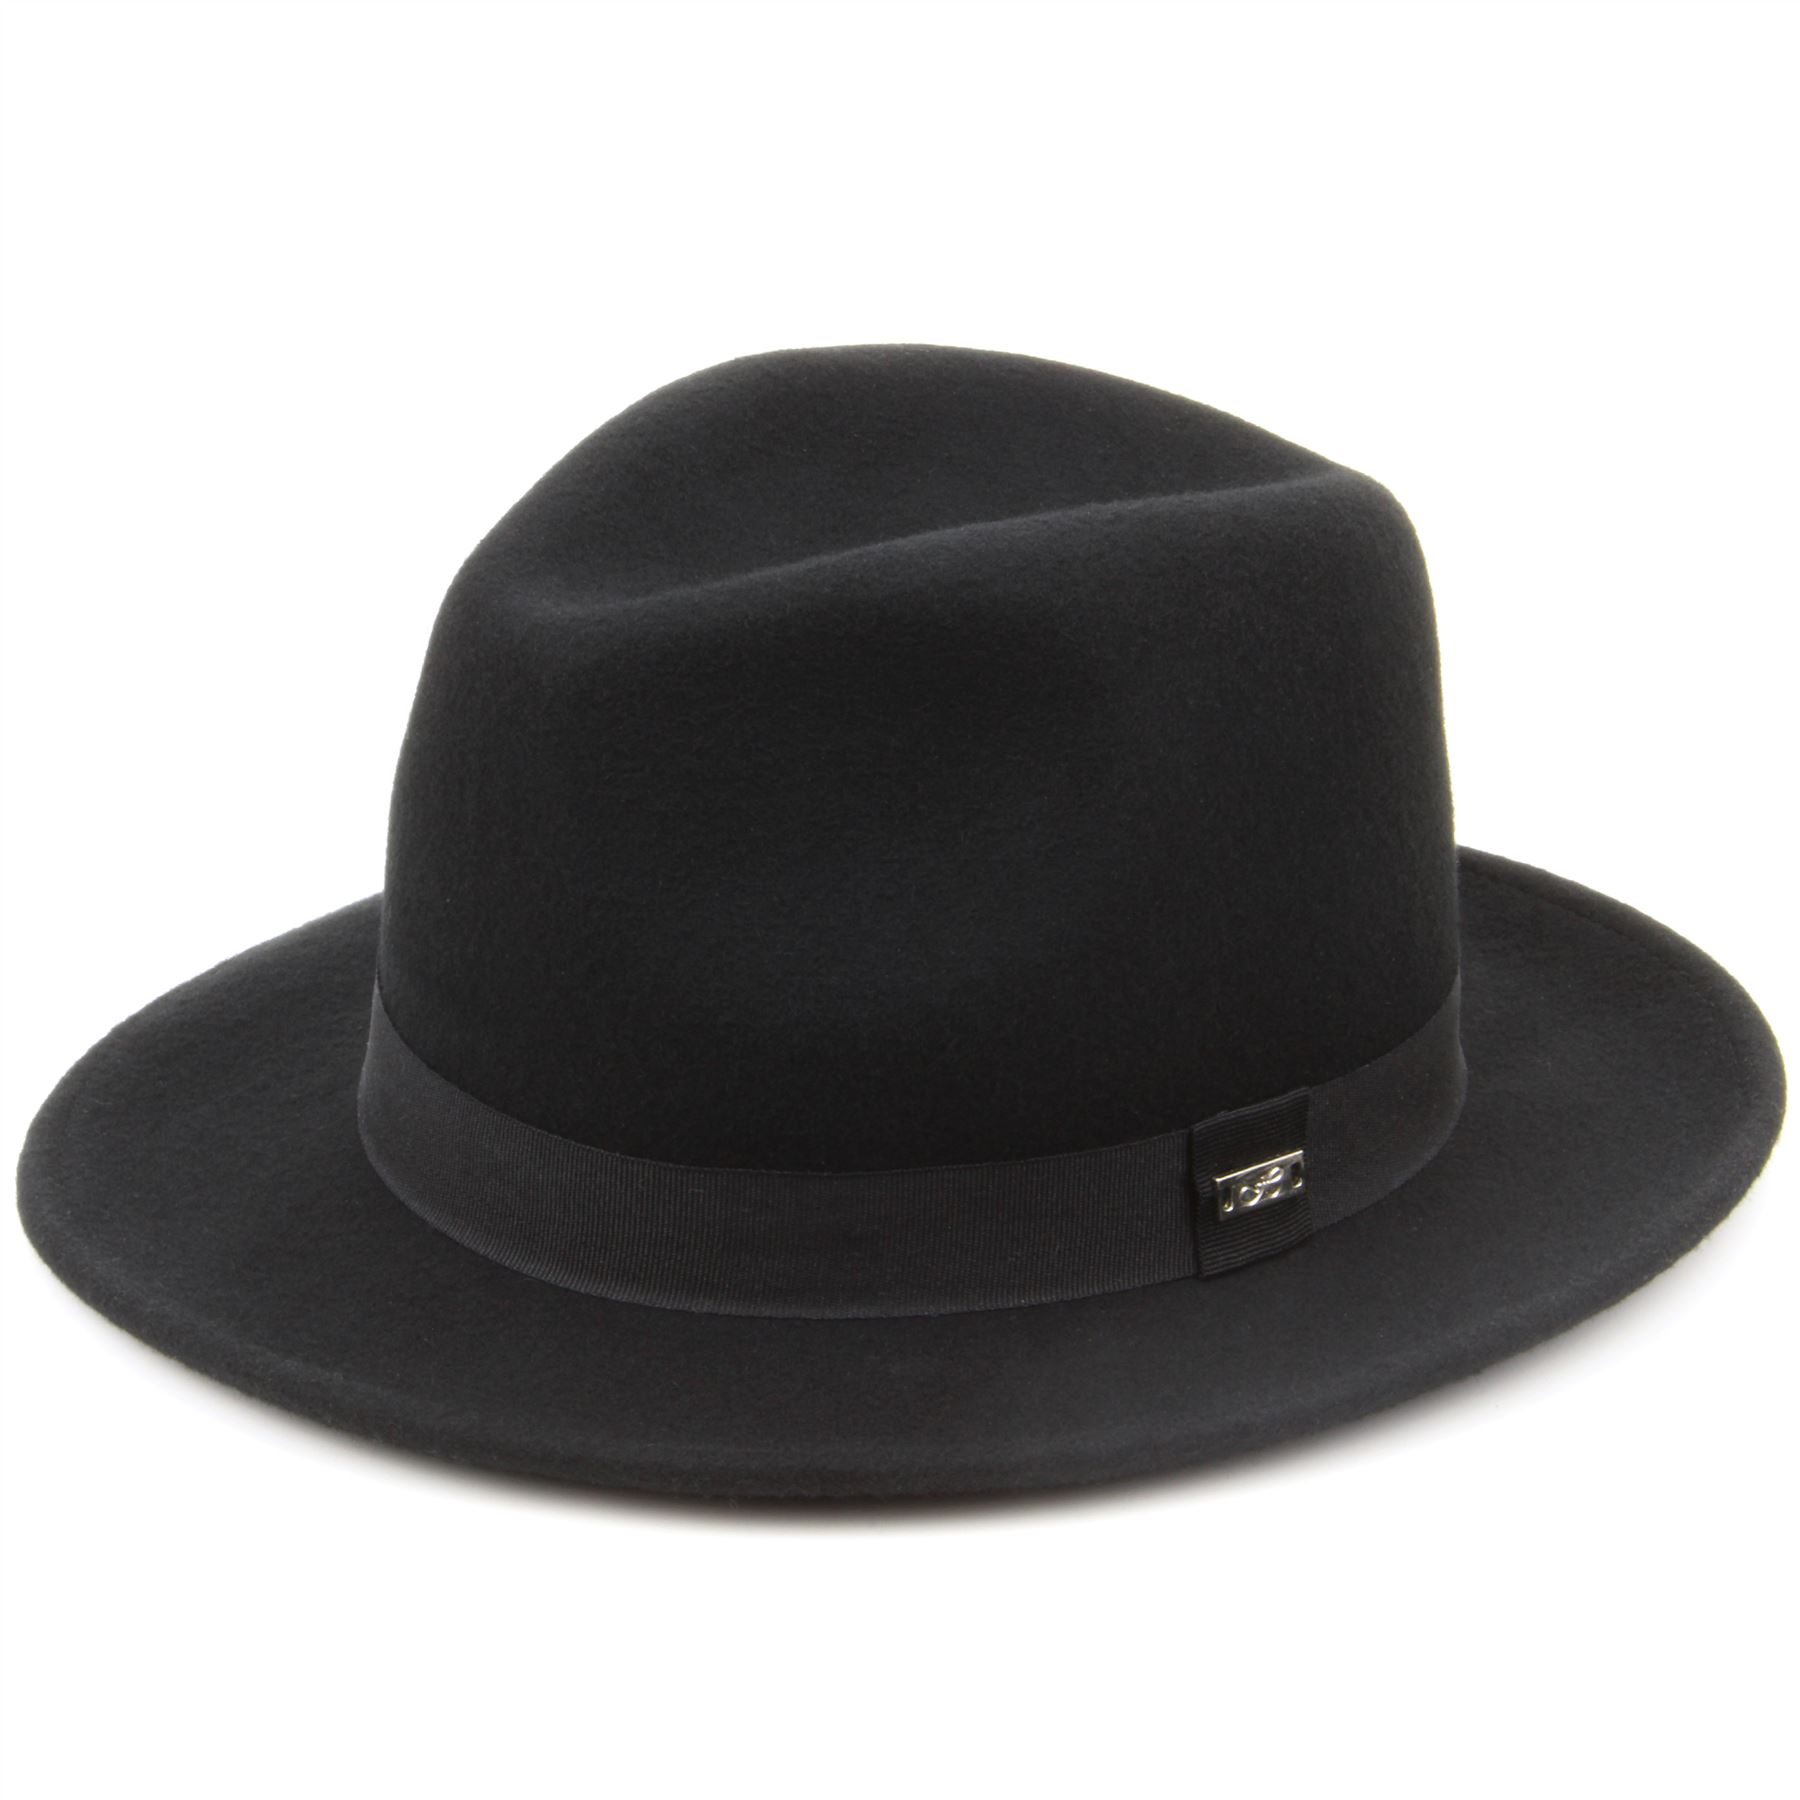 Details about Fedora Hat Trilby Black Hawkins Cap Wool Felt Ladies Men Band  Brim d45957c193b